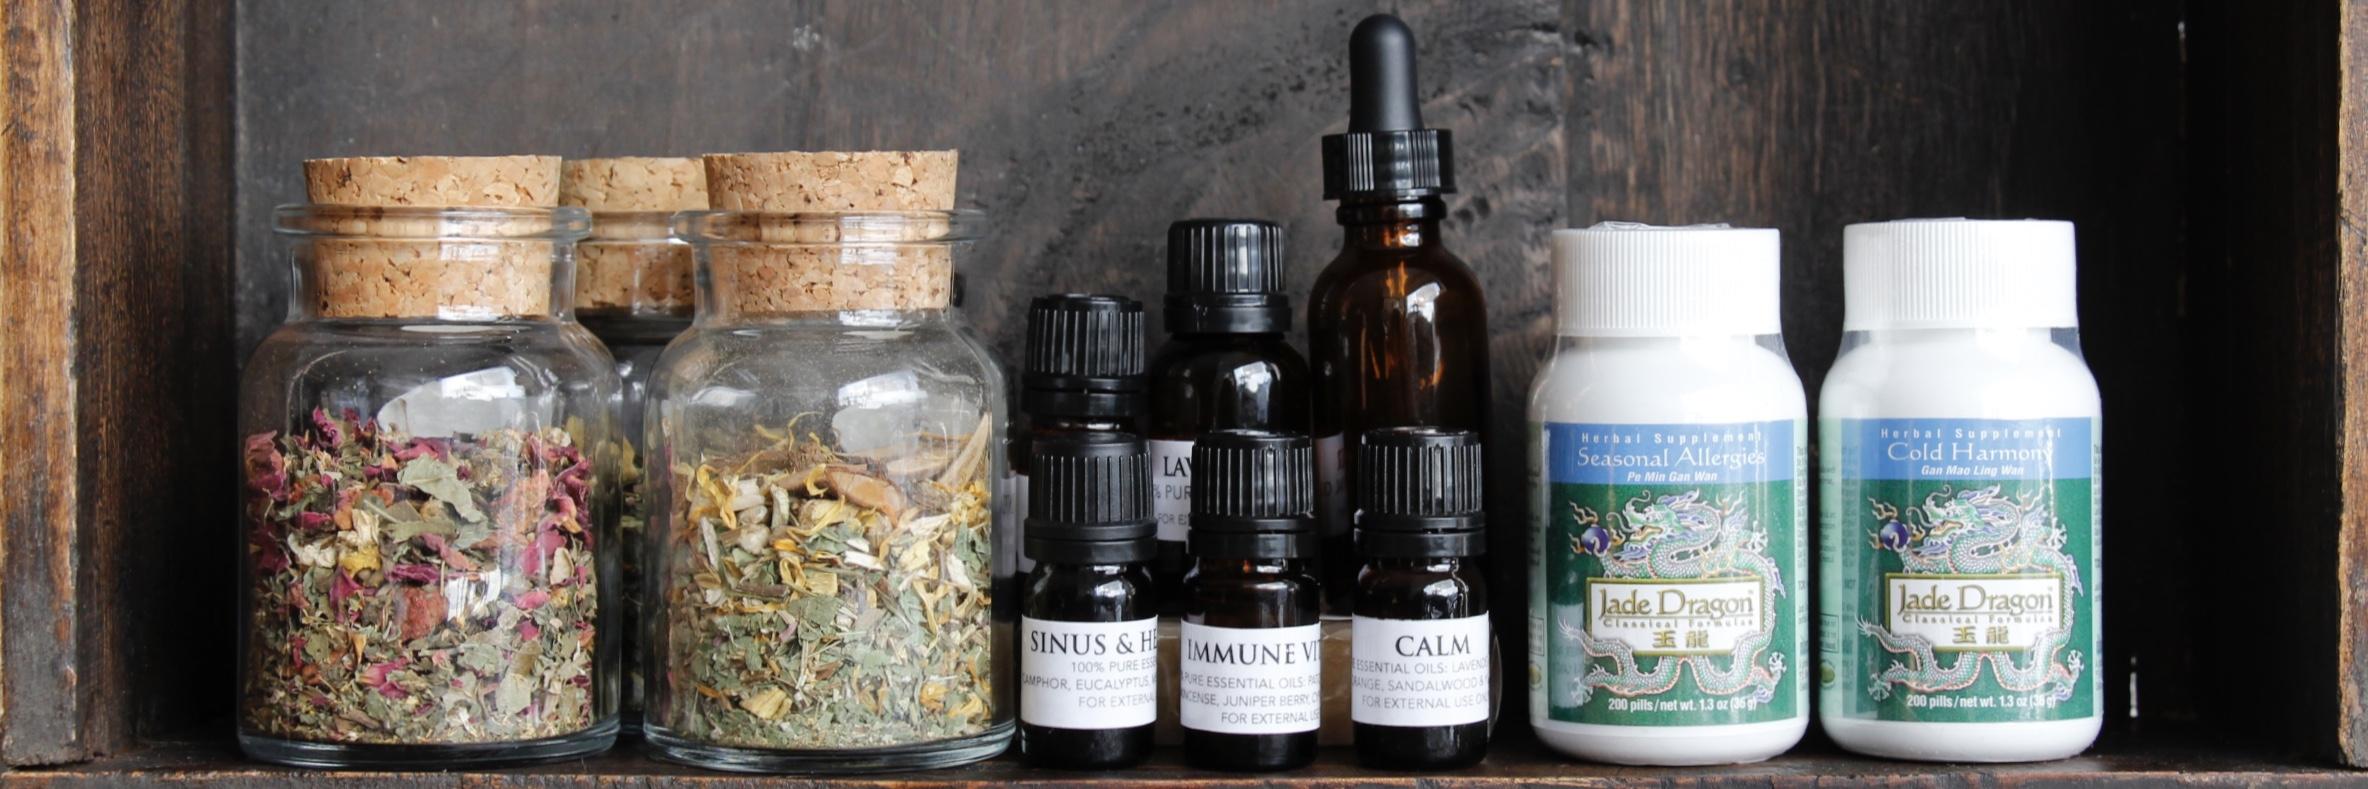 Holistic Remedies Medicine Cabinet